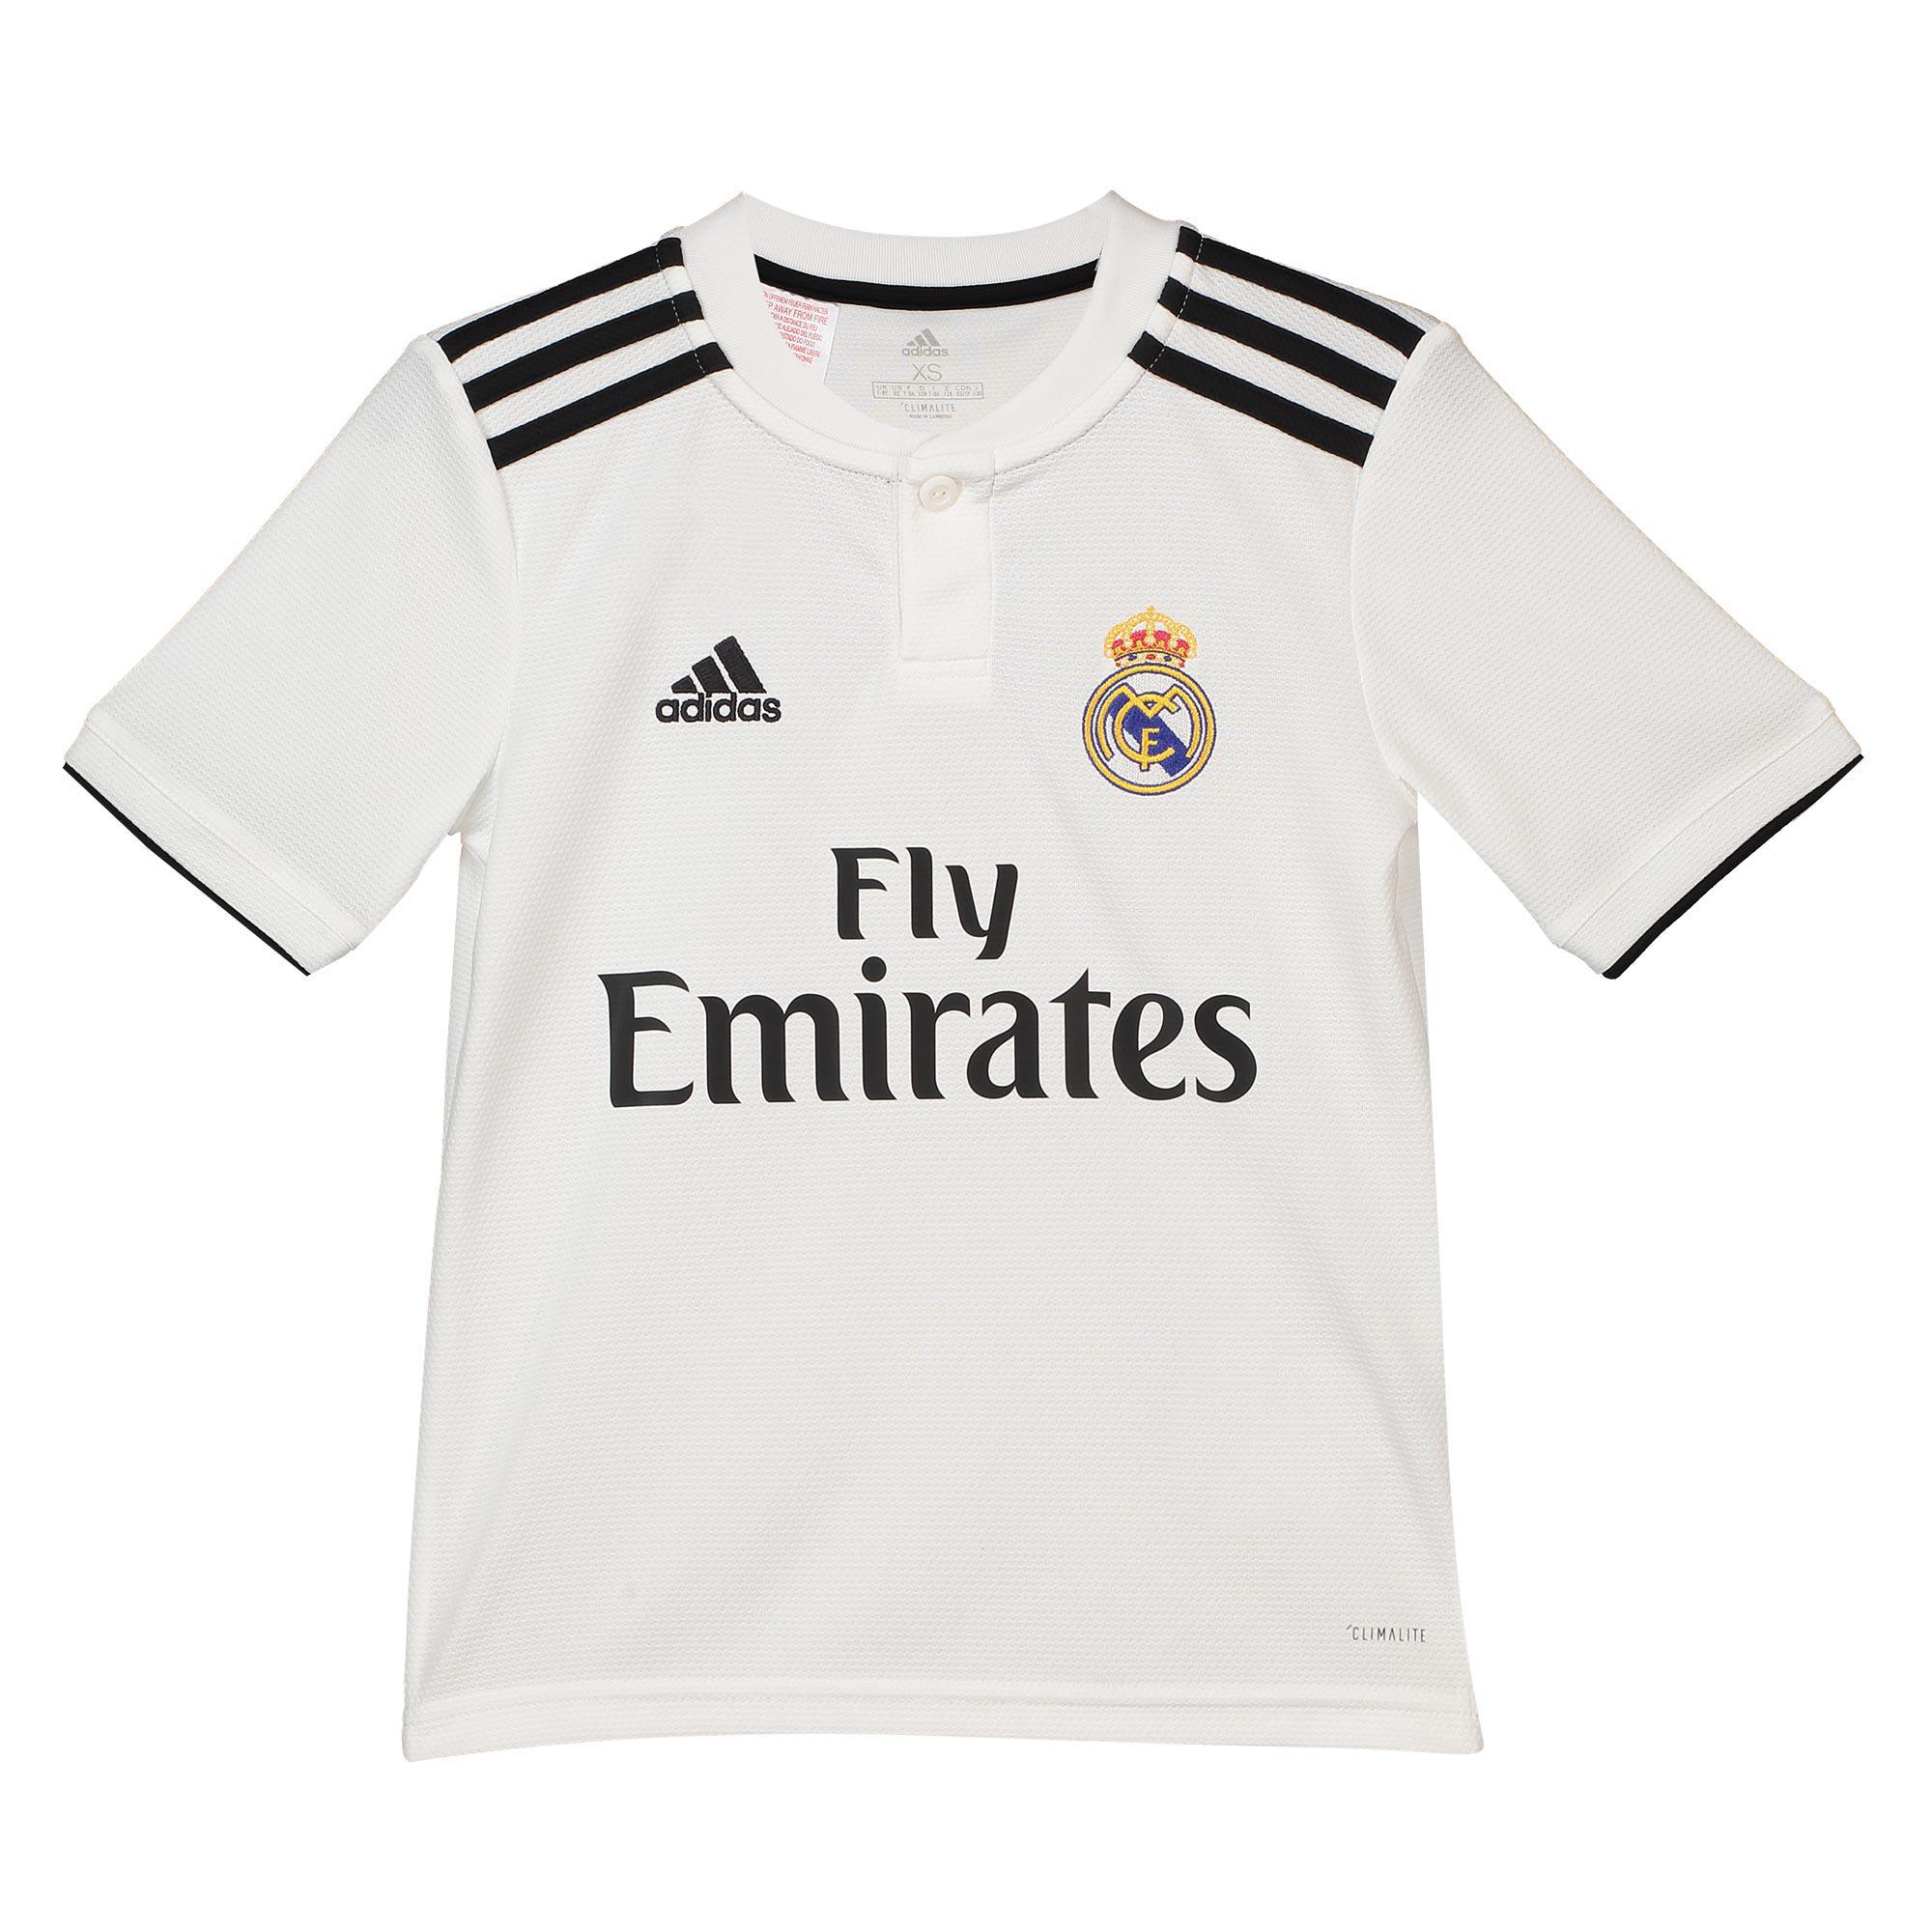 4d2fe4ae6bb Real Madrid Football Home Jersey Shirt Tee Top 2018 19 Kids adidas ...